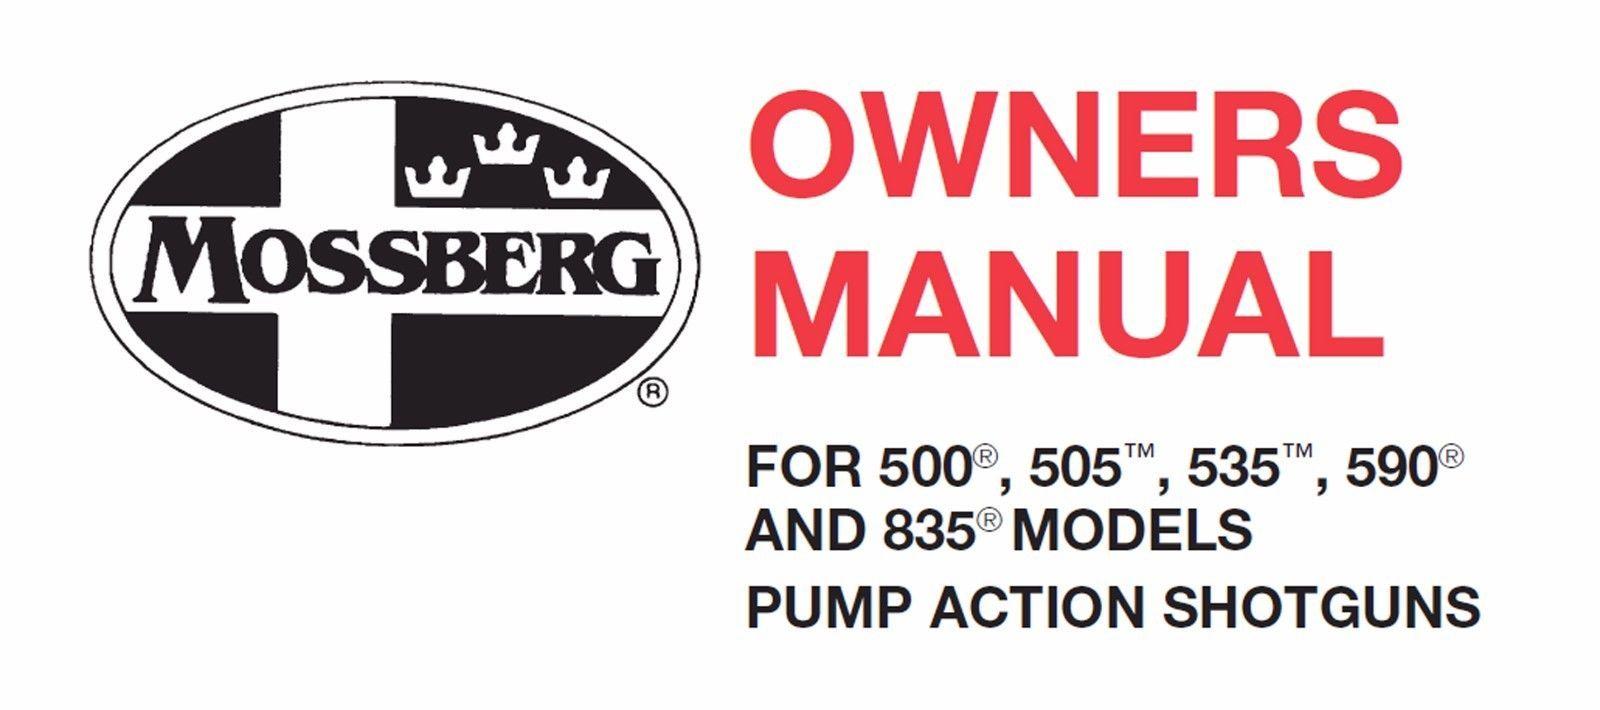 mossberg manual 13 listings rh m bonanza com Diagram of Mossberg 500 Shotgun Mossberg Owners